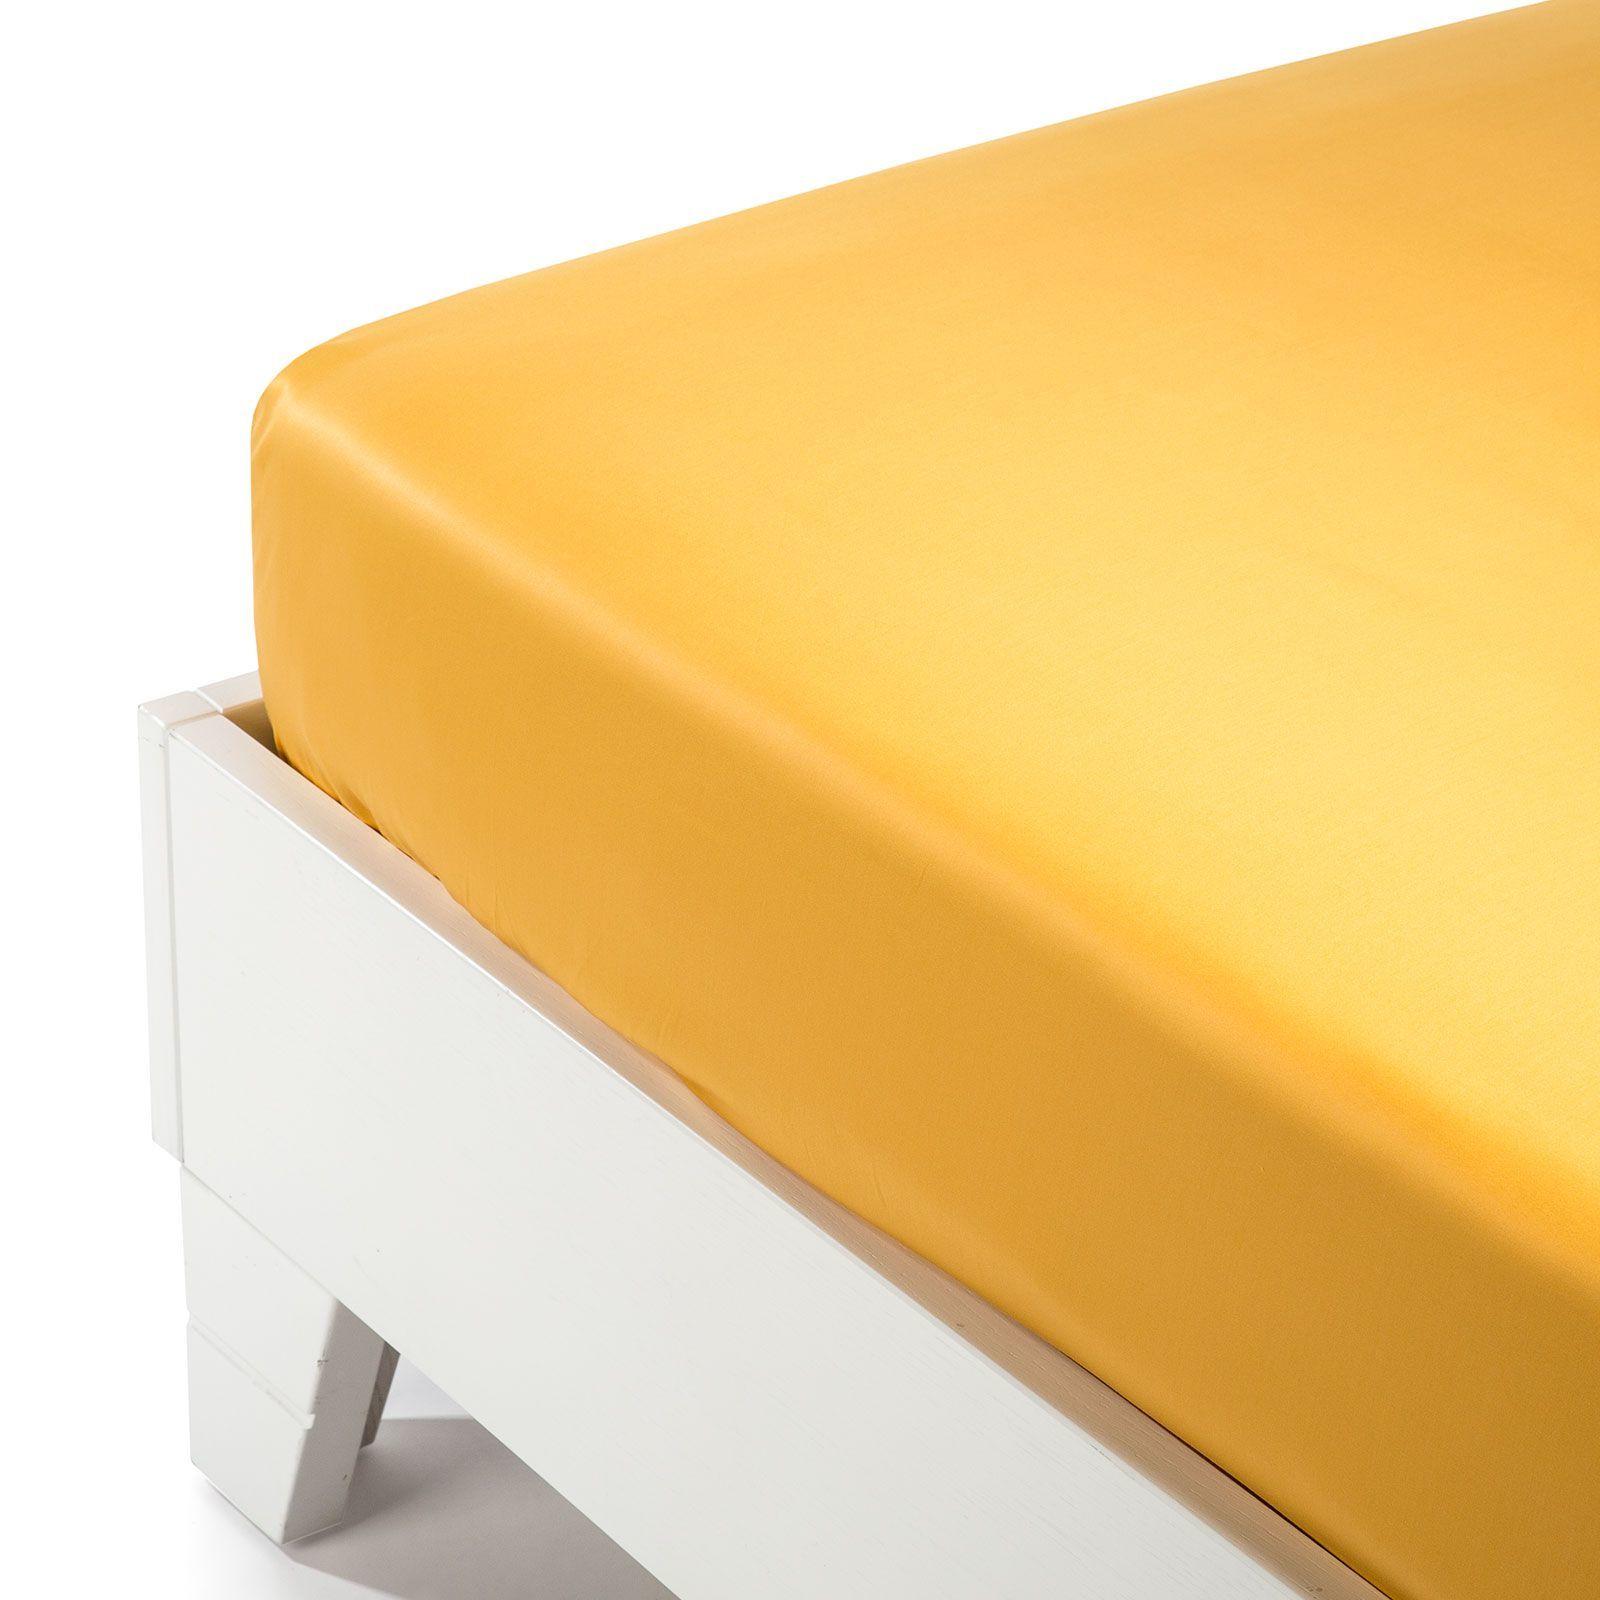 На резинке Простыня на резинке 180x200 Сaleffi Raso Tinta Unito с бордюром сатин золотая prostynya-na-rezinke-160x200-saleffi-raso-tinta-unito-s-bordyurom-satin-oro-italiya.jpg